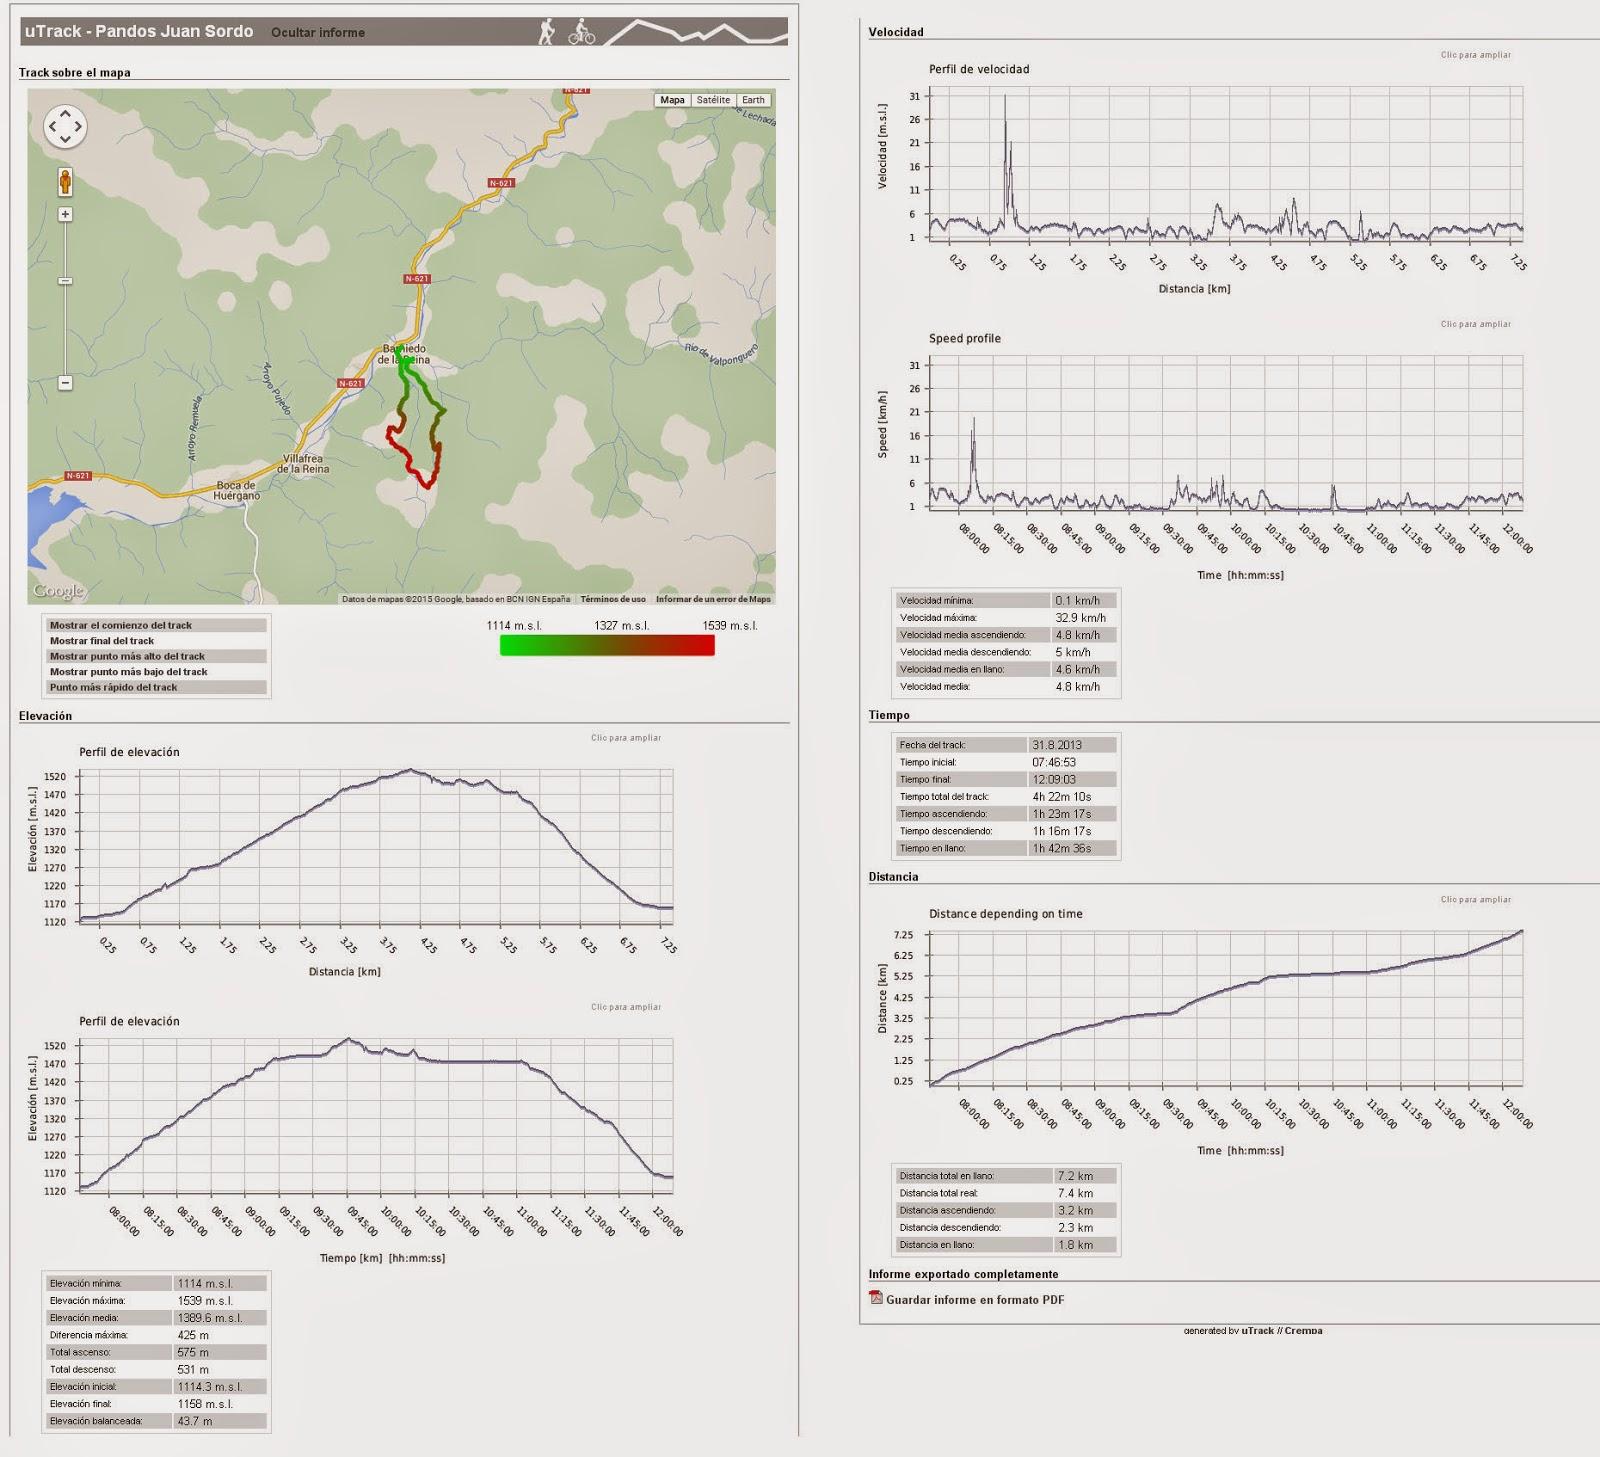 ibp index p gina cl sica en el mundo de la bicicleta el ndice ibp es un sistema de valoraci n autom tico que punt a la dificultad de una ruta recorrida  [ 1600 x 1457 Pixel ]